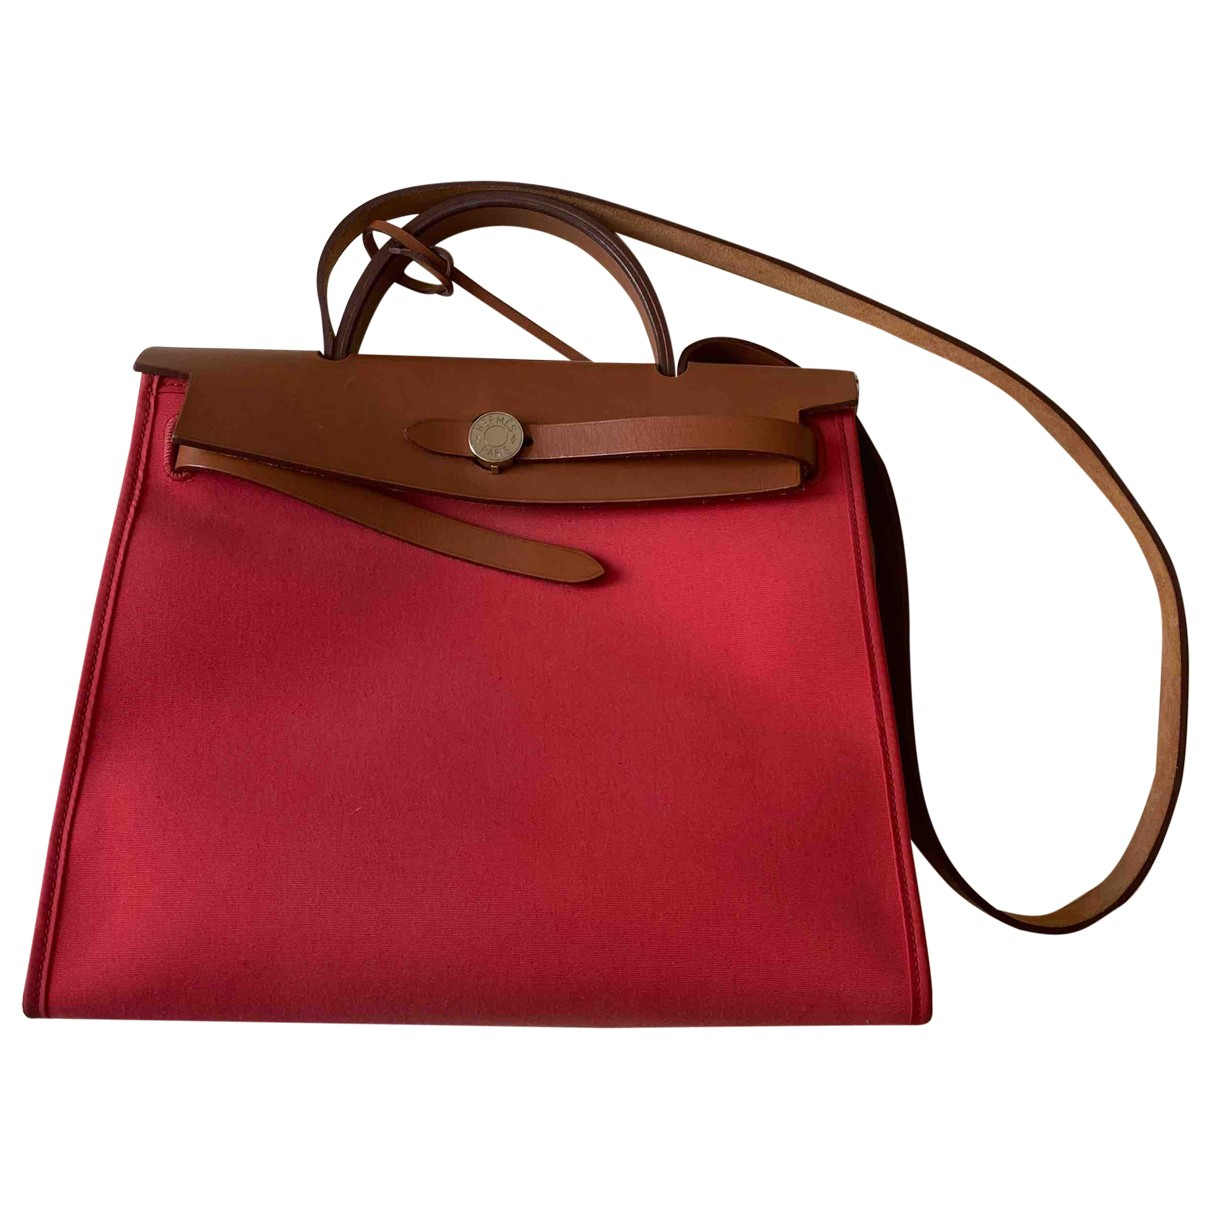 Hermes - Sac a main Herbag pour femme en cuir - rouge